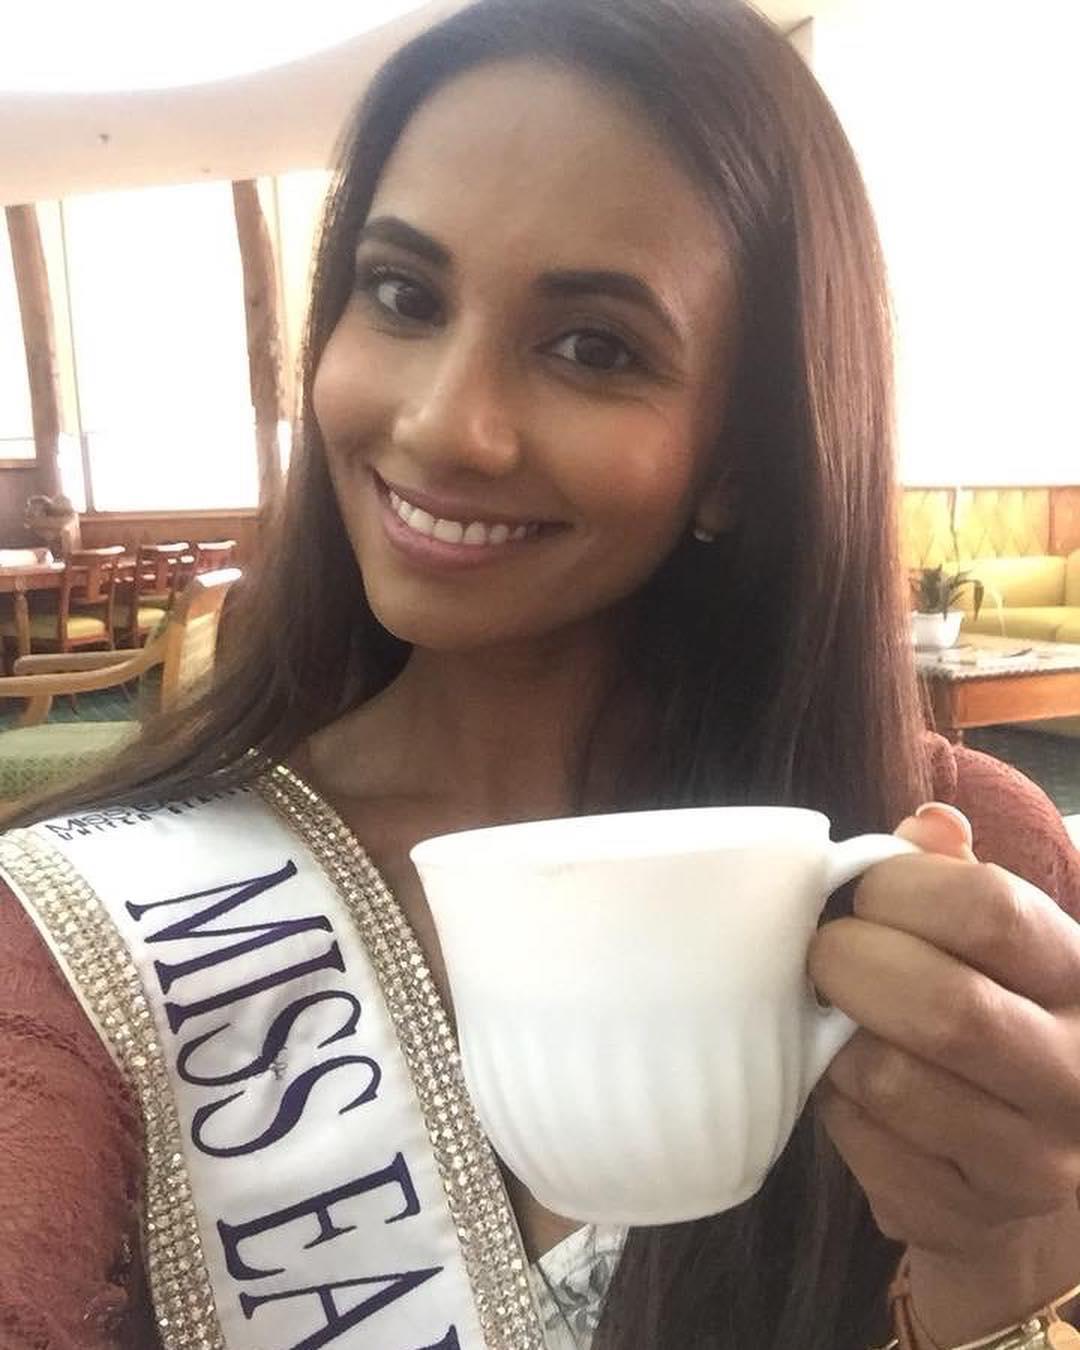 yashvi aware, miss earth usa 2018. - Página 2 42837210